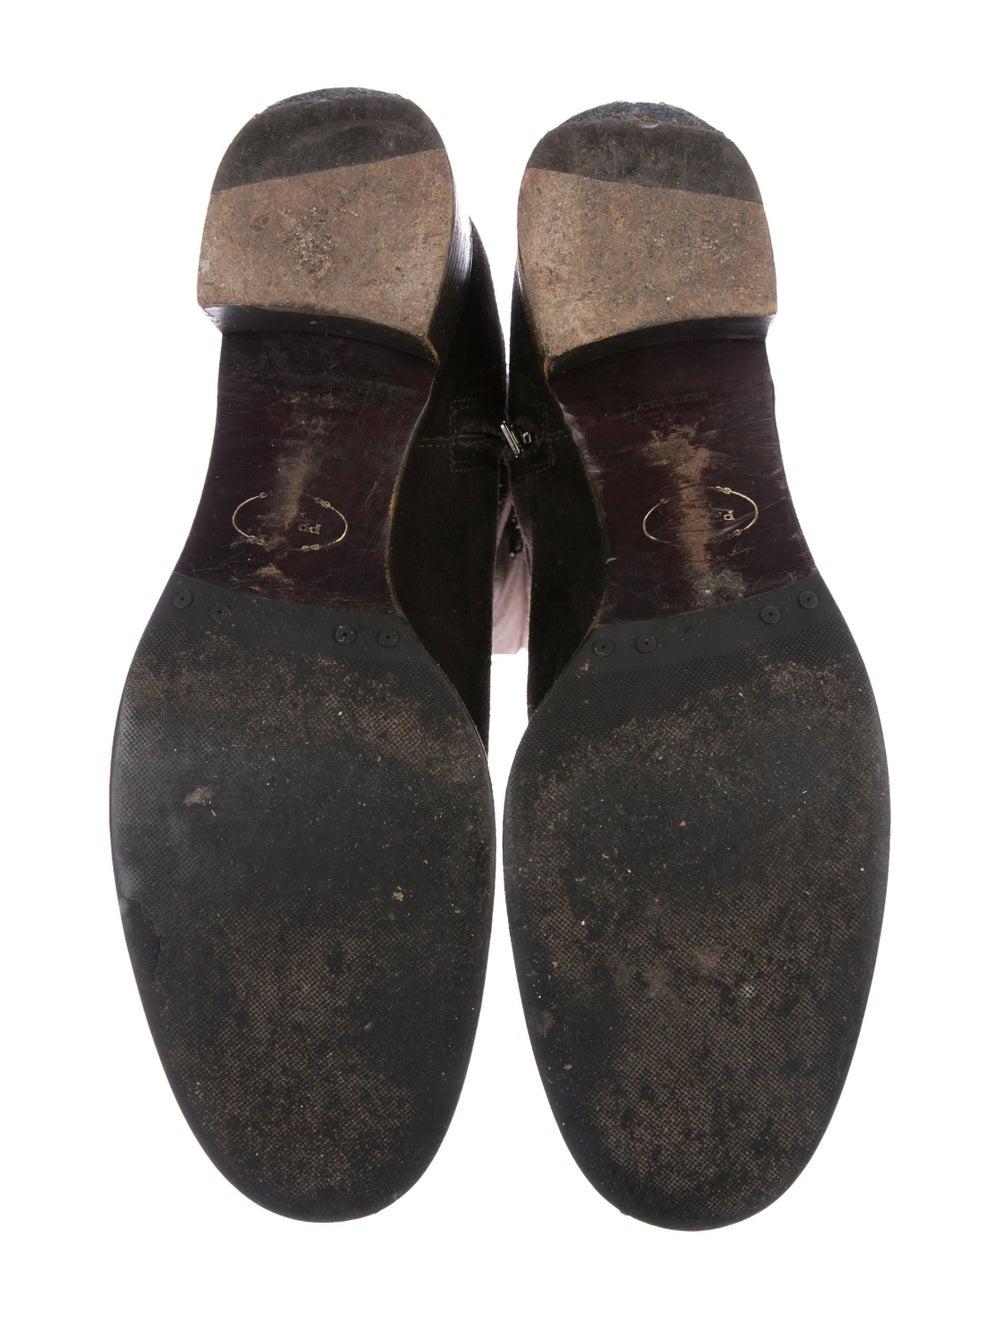 Prada Suede Knee-High Boots - image 5